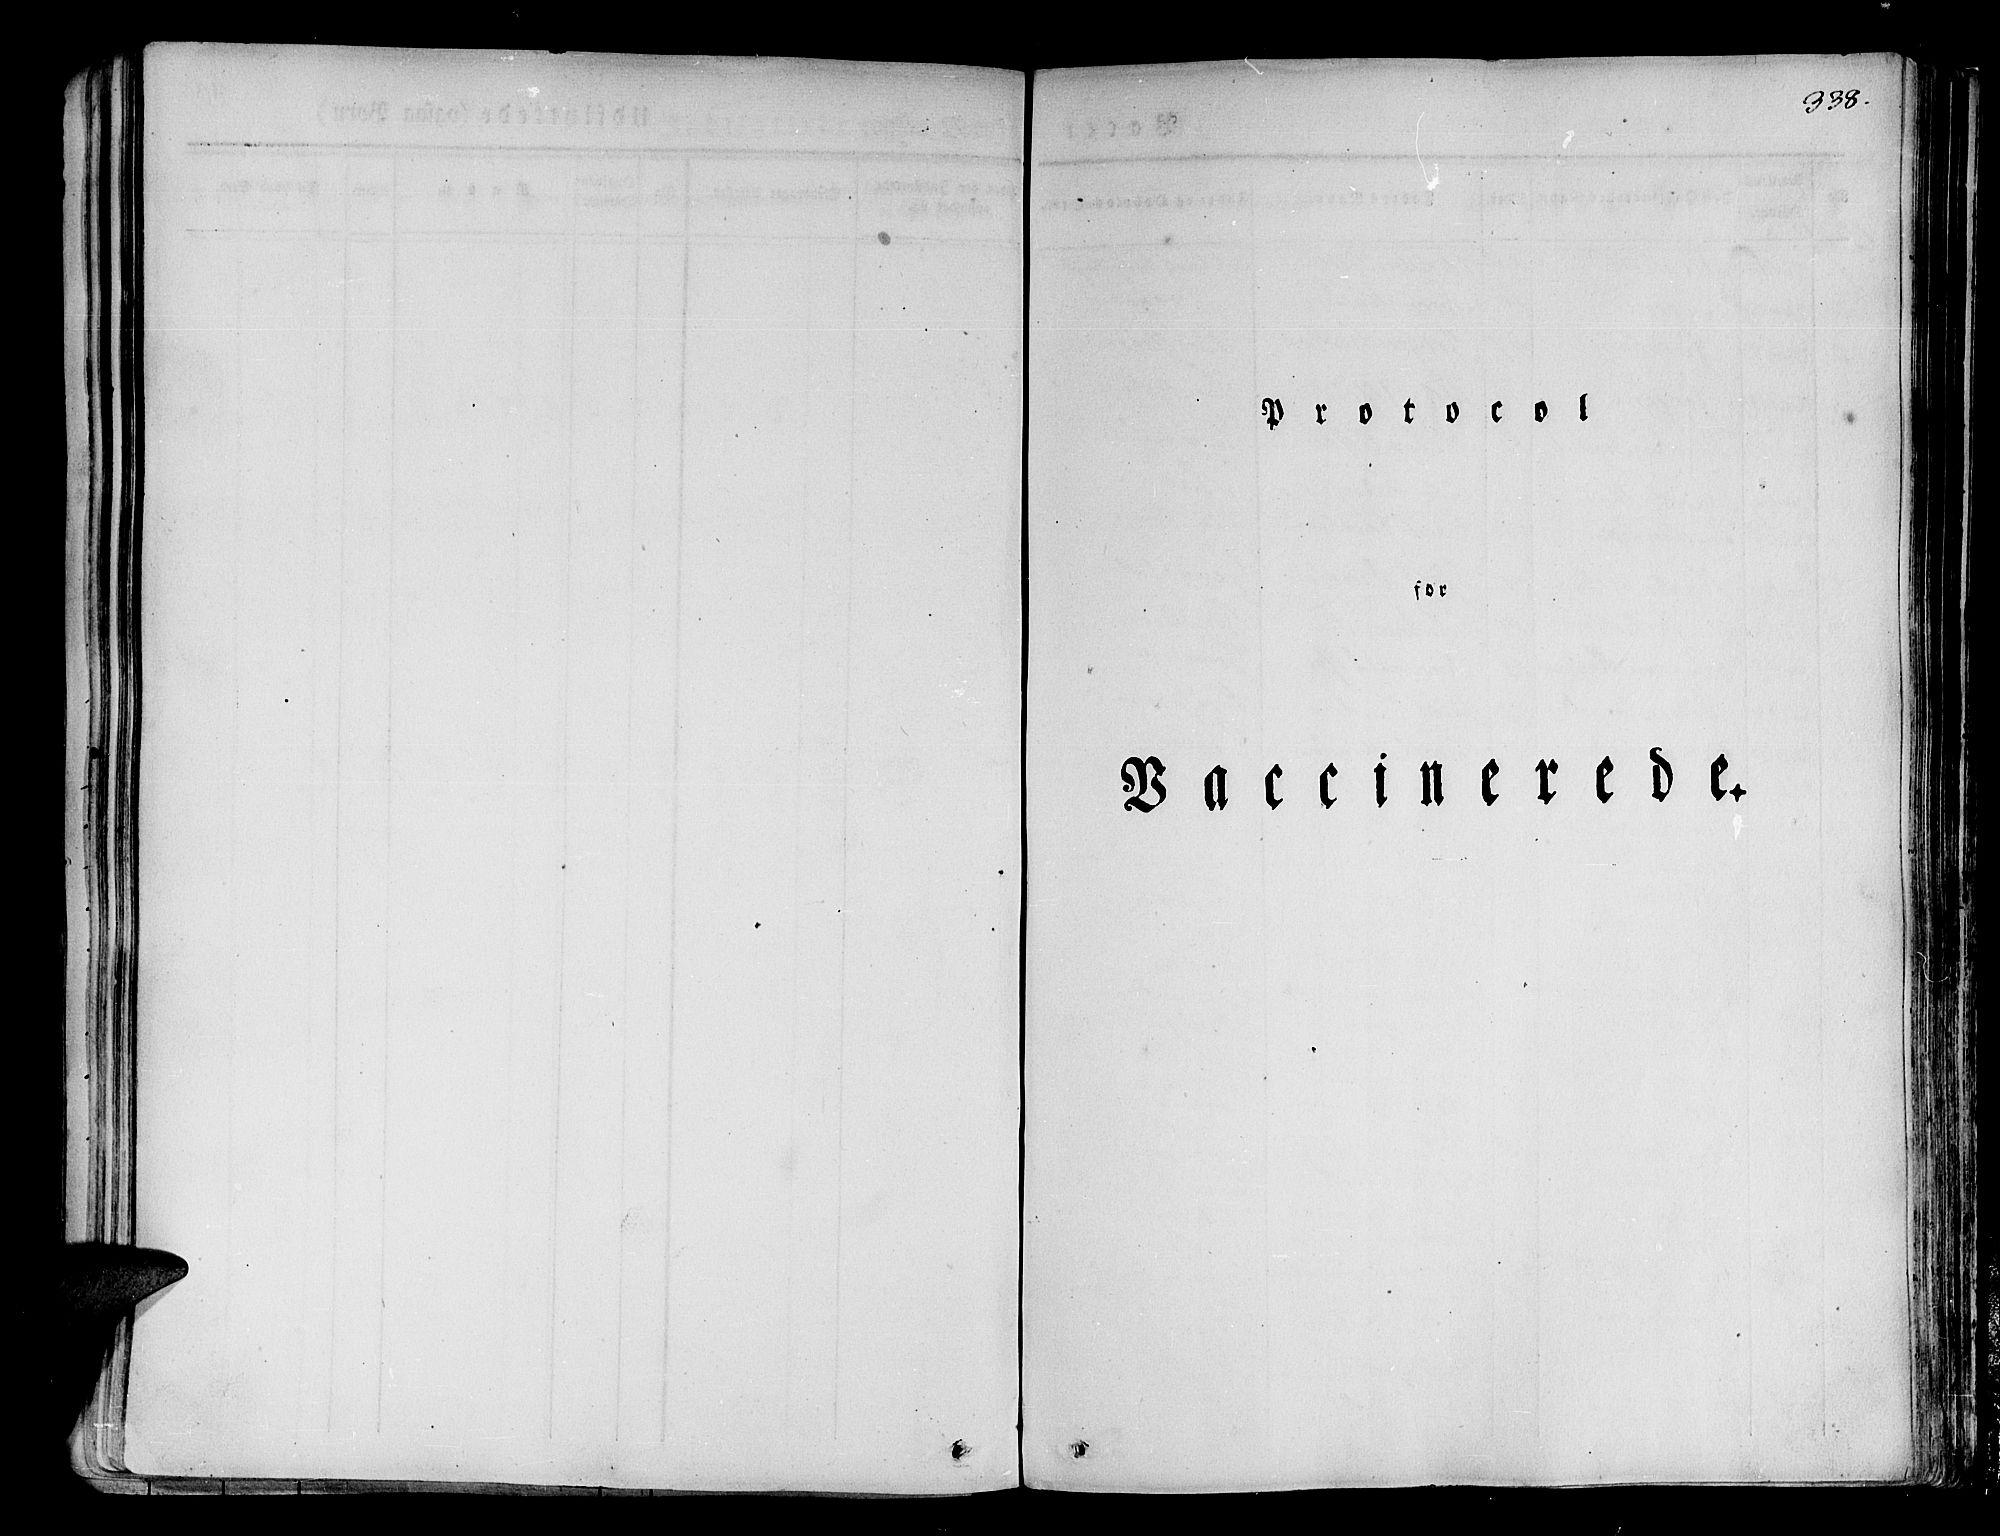 SATØ, Tranøy sokneprestkontor, I/Ia/Iaa/L0005kirke: Ministerialbok nr. 5, 1829-1844, s. 338